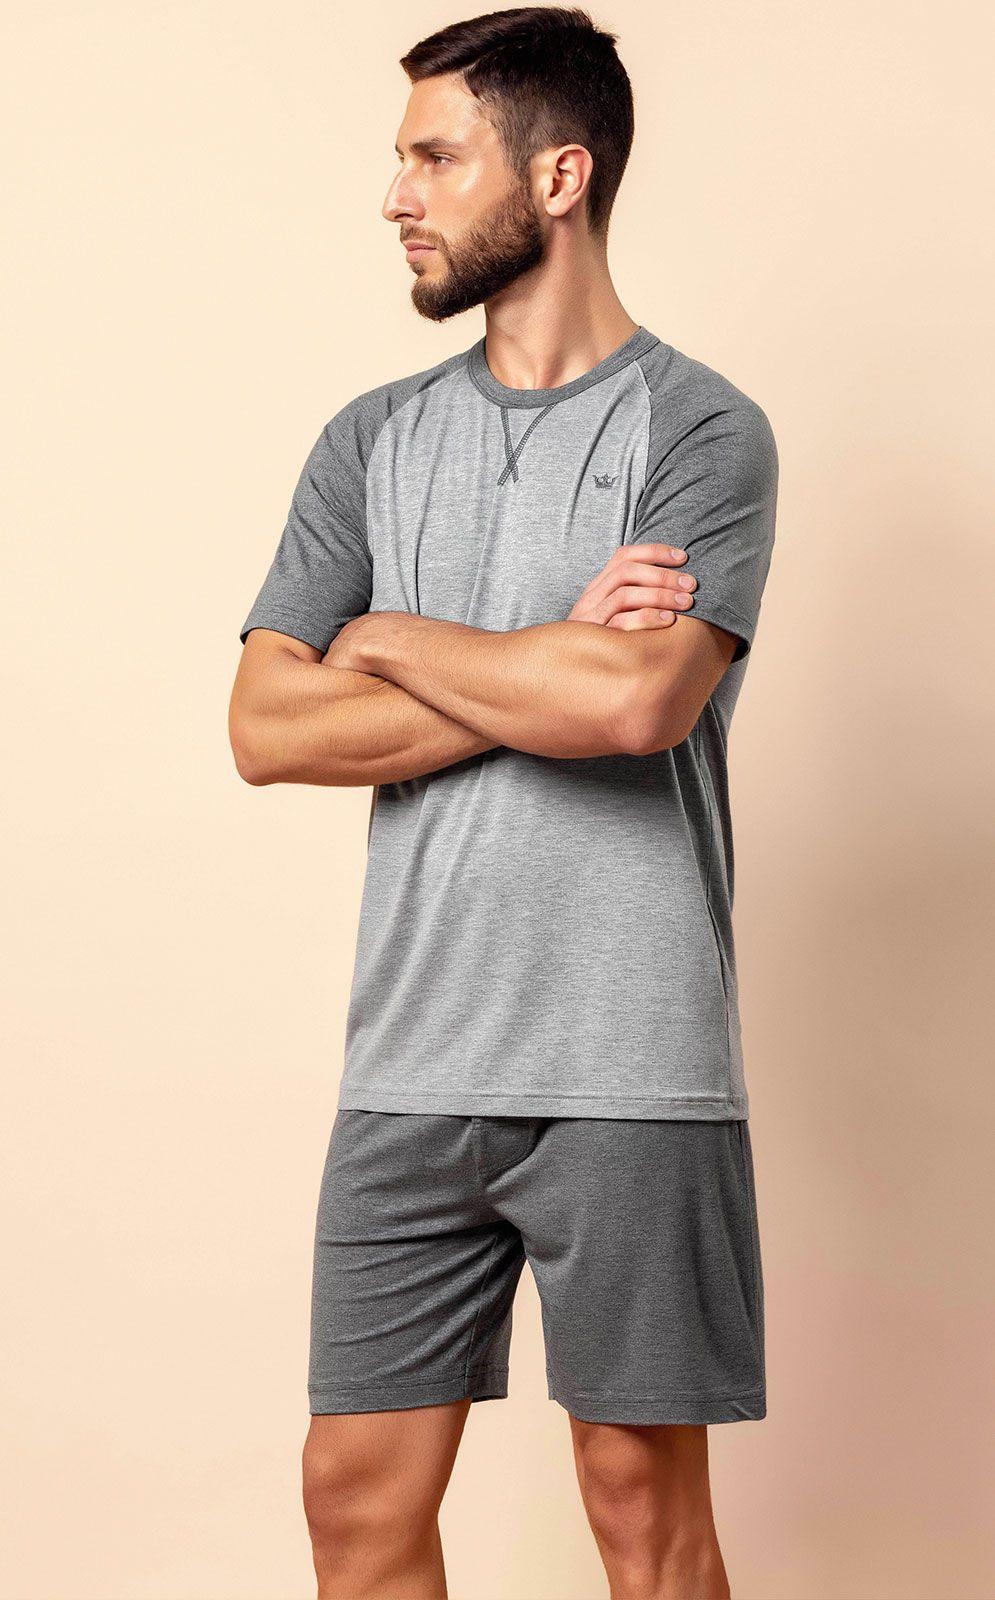 Pijama Masculino Adulto Mixte Camiseta com  Bermuda na cor Cinza em Modal 9570